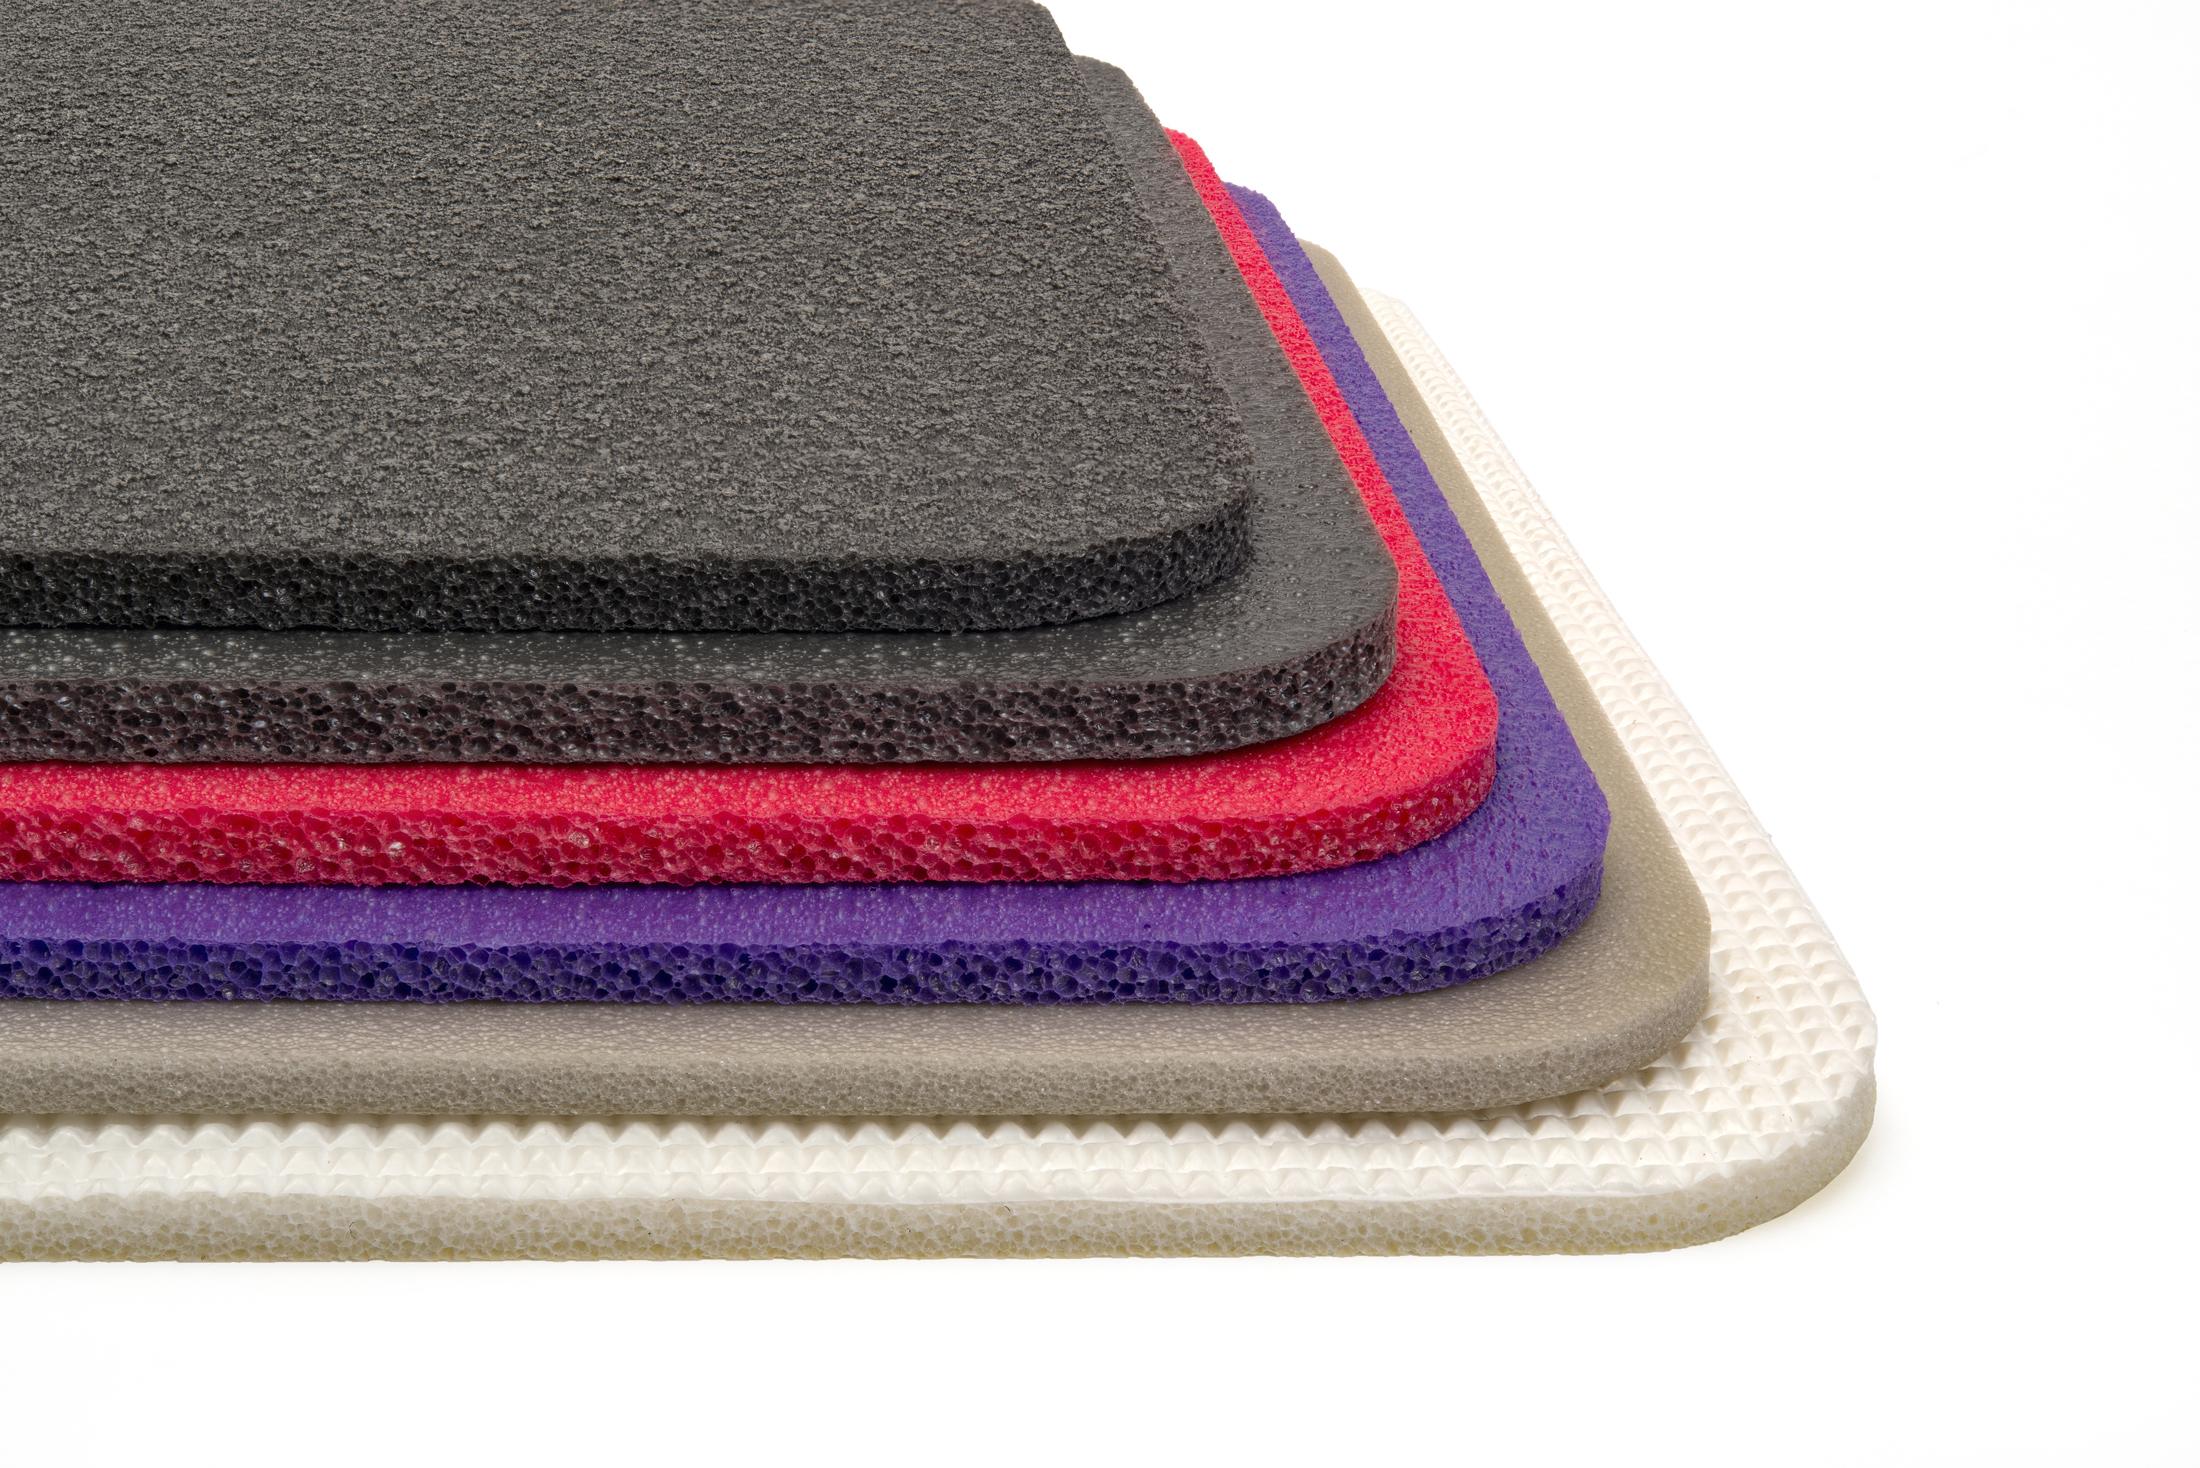 polyethylene-foam-multi-color-material-shockproof--compressed